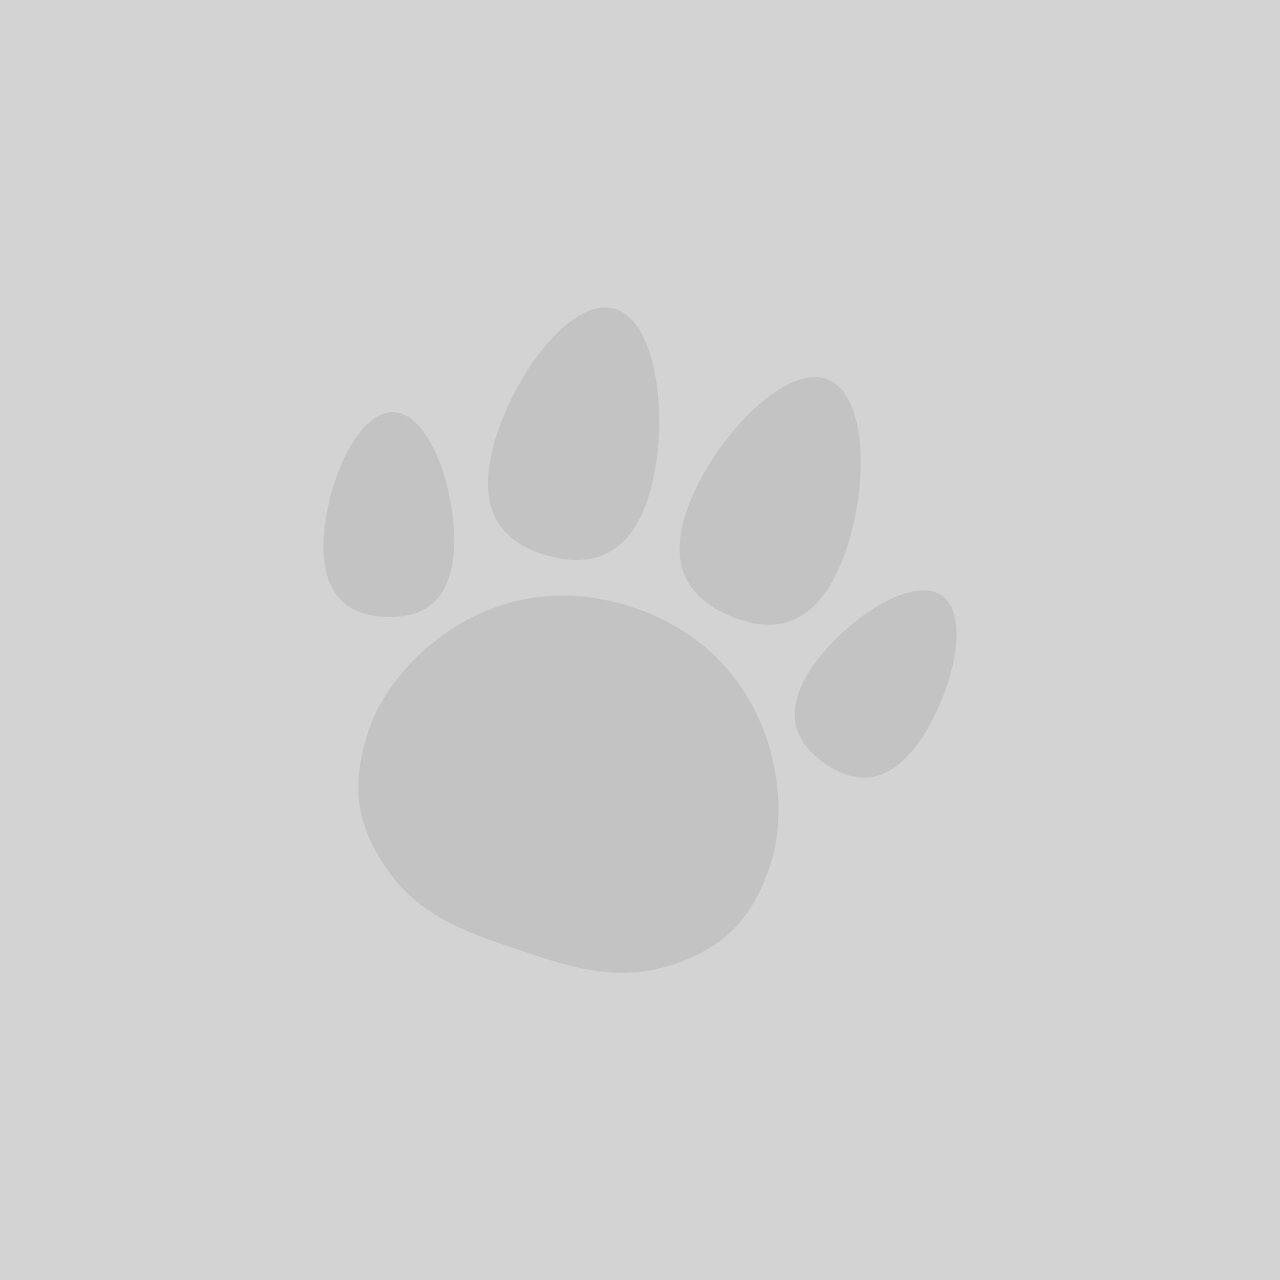 Flexi Classic Retractable Tape Large Dog Lead 5m - Black